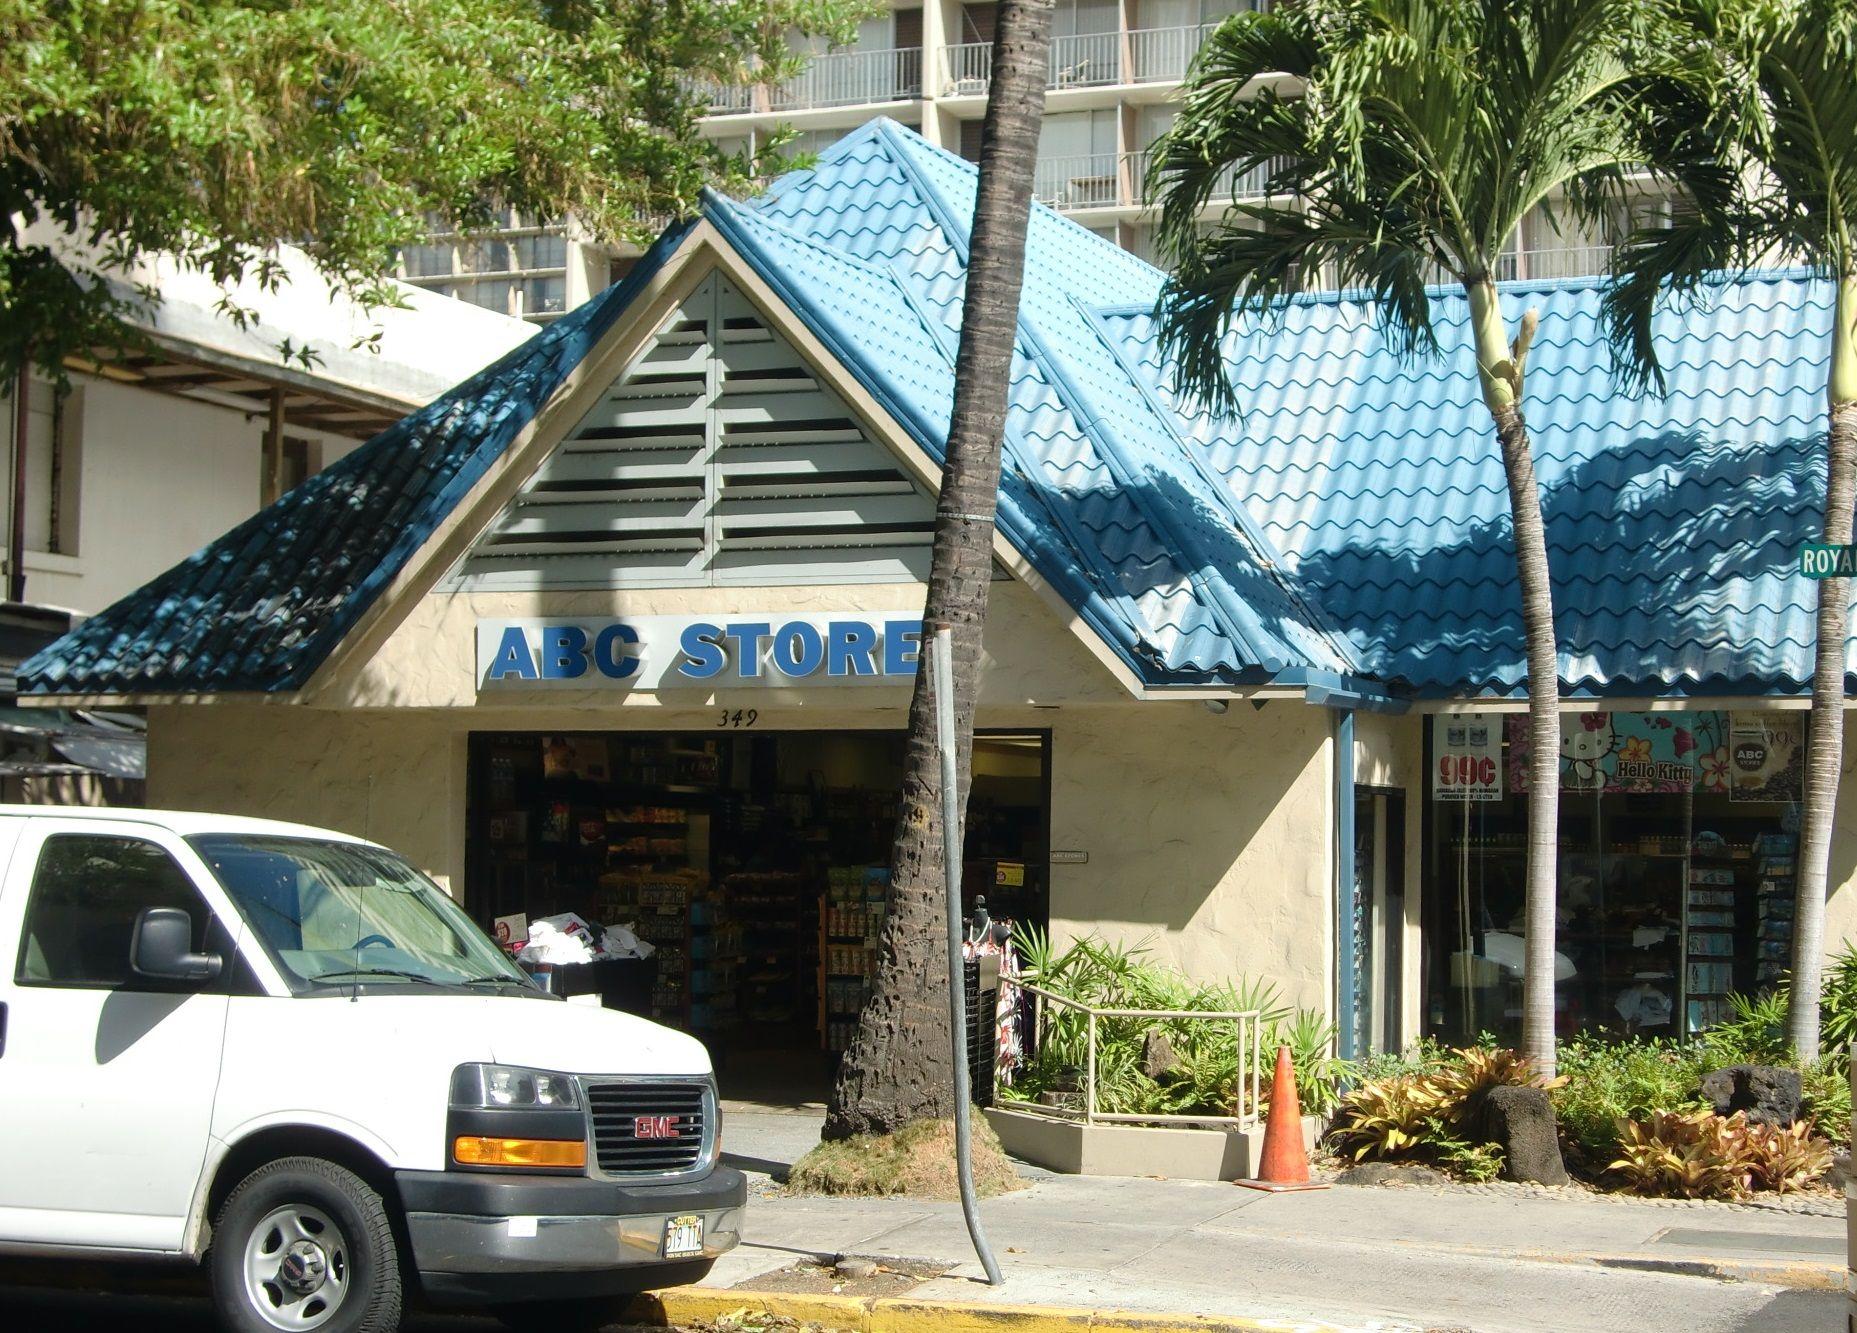 Abc Store Waikiki Hawaii Waikiki Honolulu